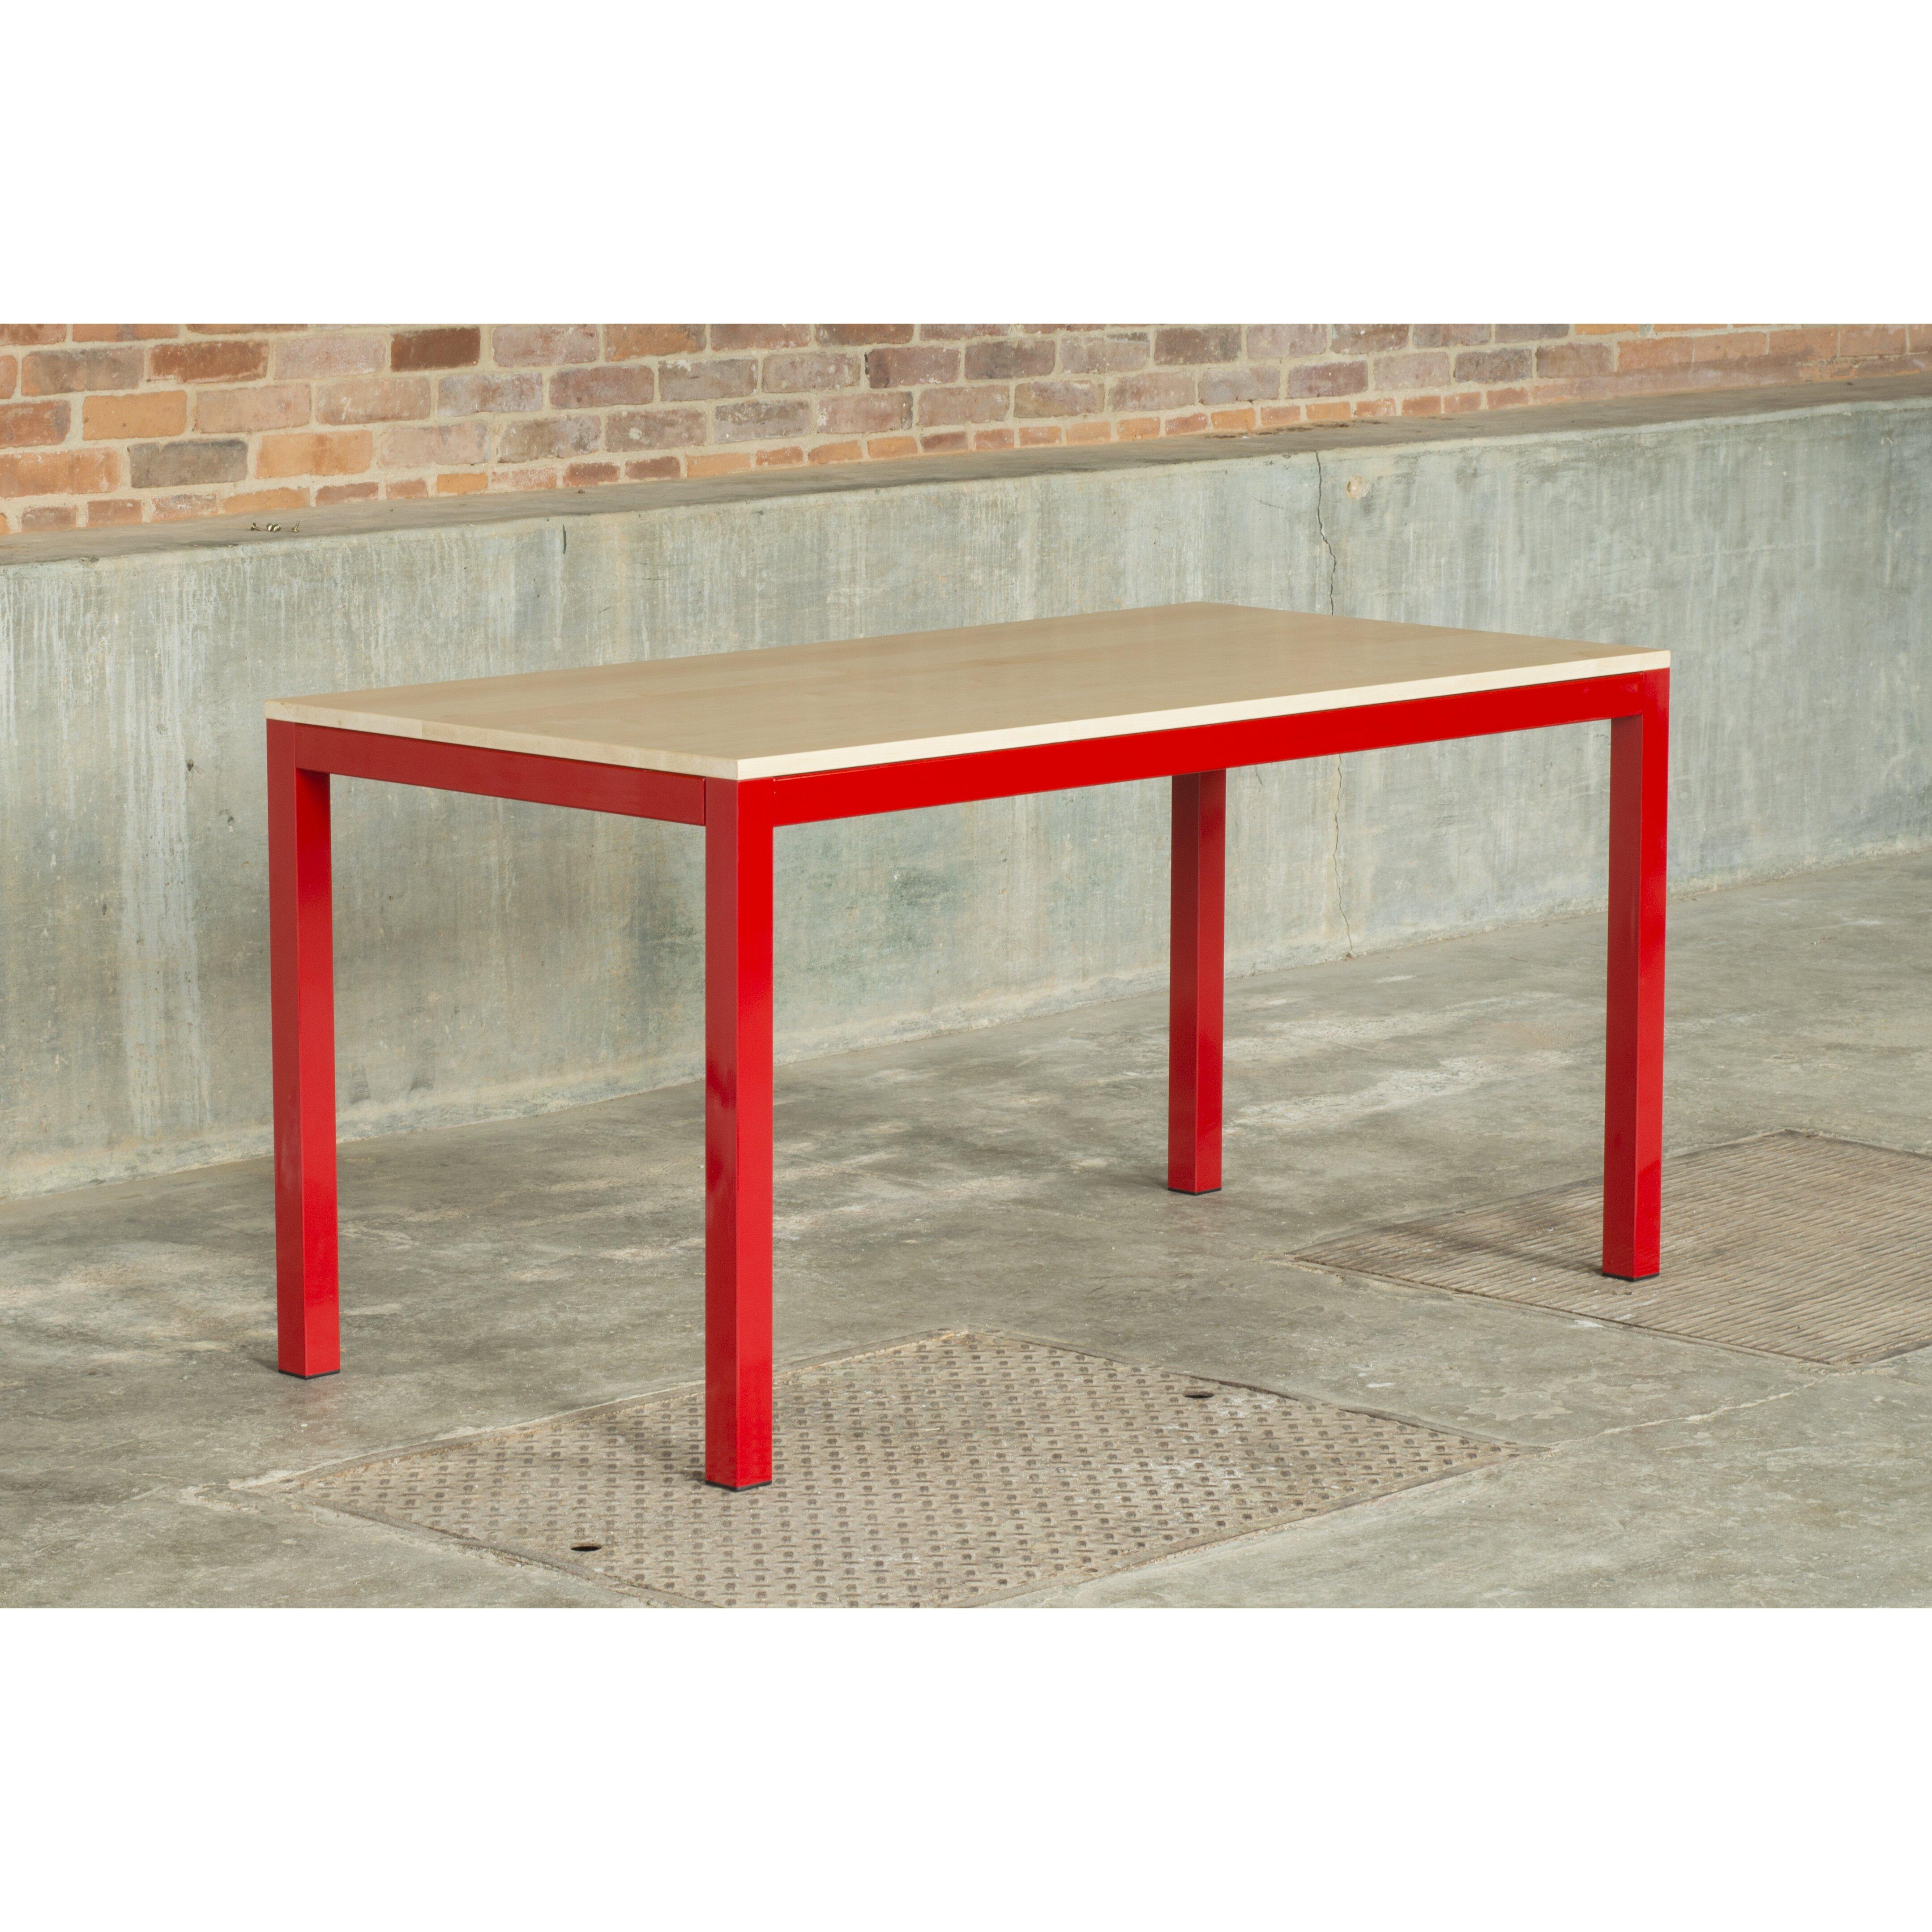 Elan Furniture Loft 60x30 Dining Table amp Reviews  : Elan Furniture Loft 6025E22580259Dx3025E22580259D Dining Table from www.wayfairsupply.com size 4316 x 4316 jpeg 2629kB